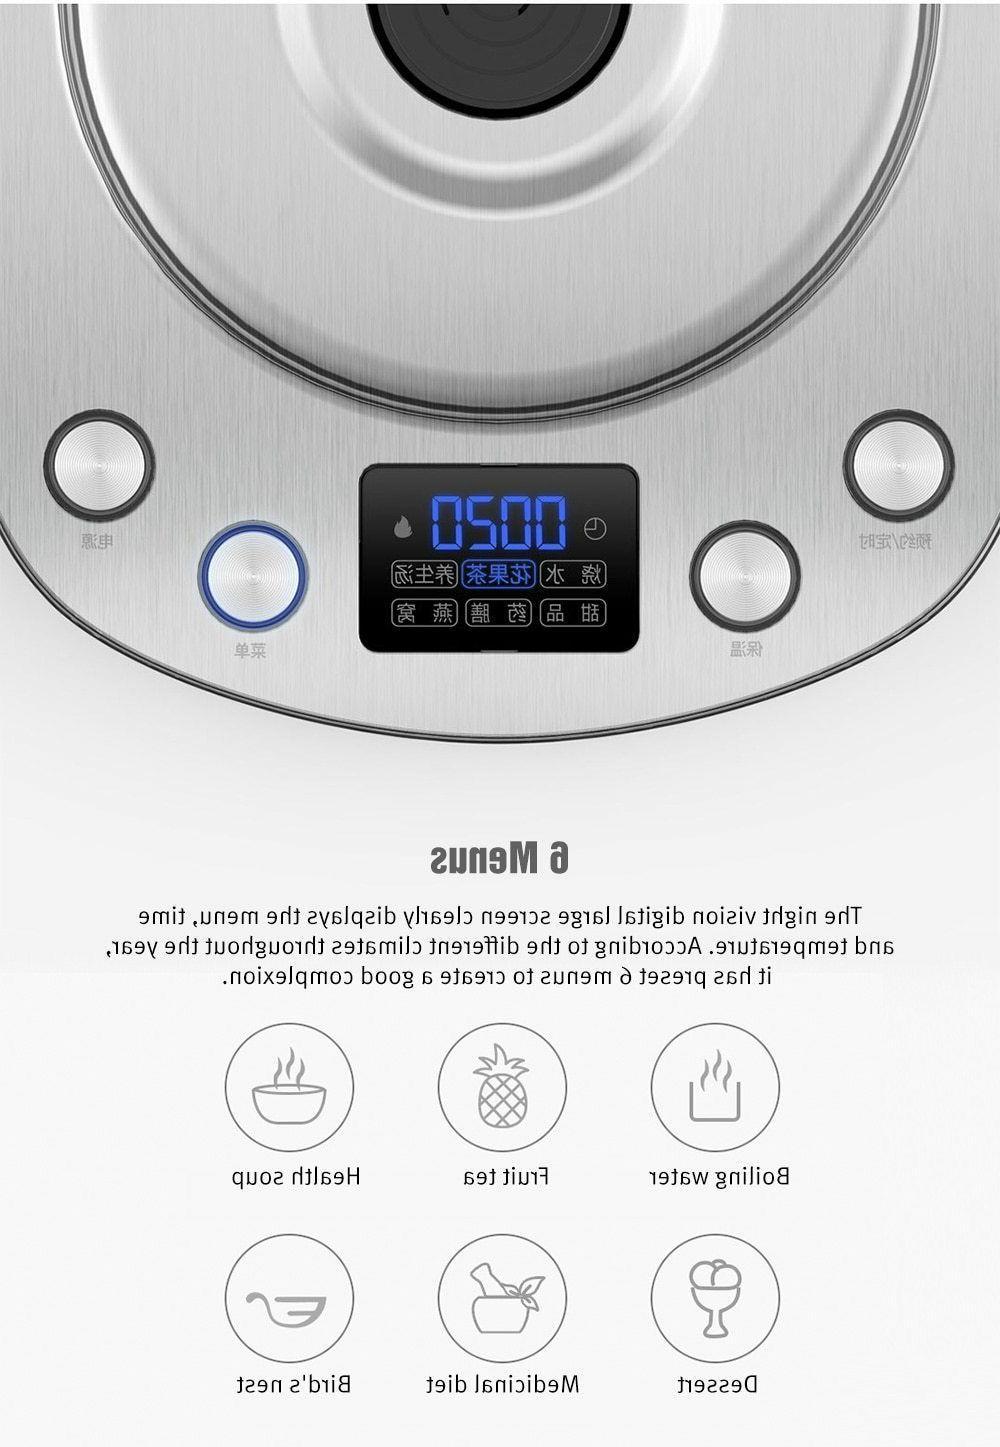 Electric Tea Kattle Litter Stainless Steel Water Heater Pot